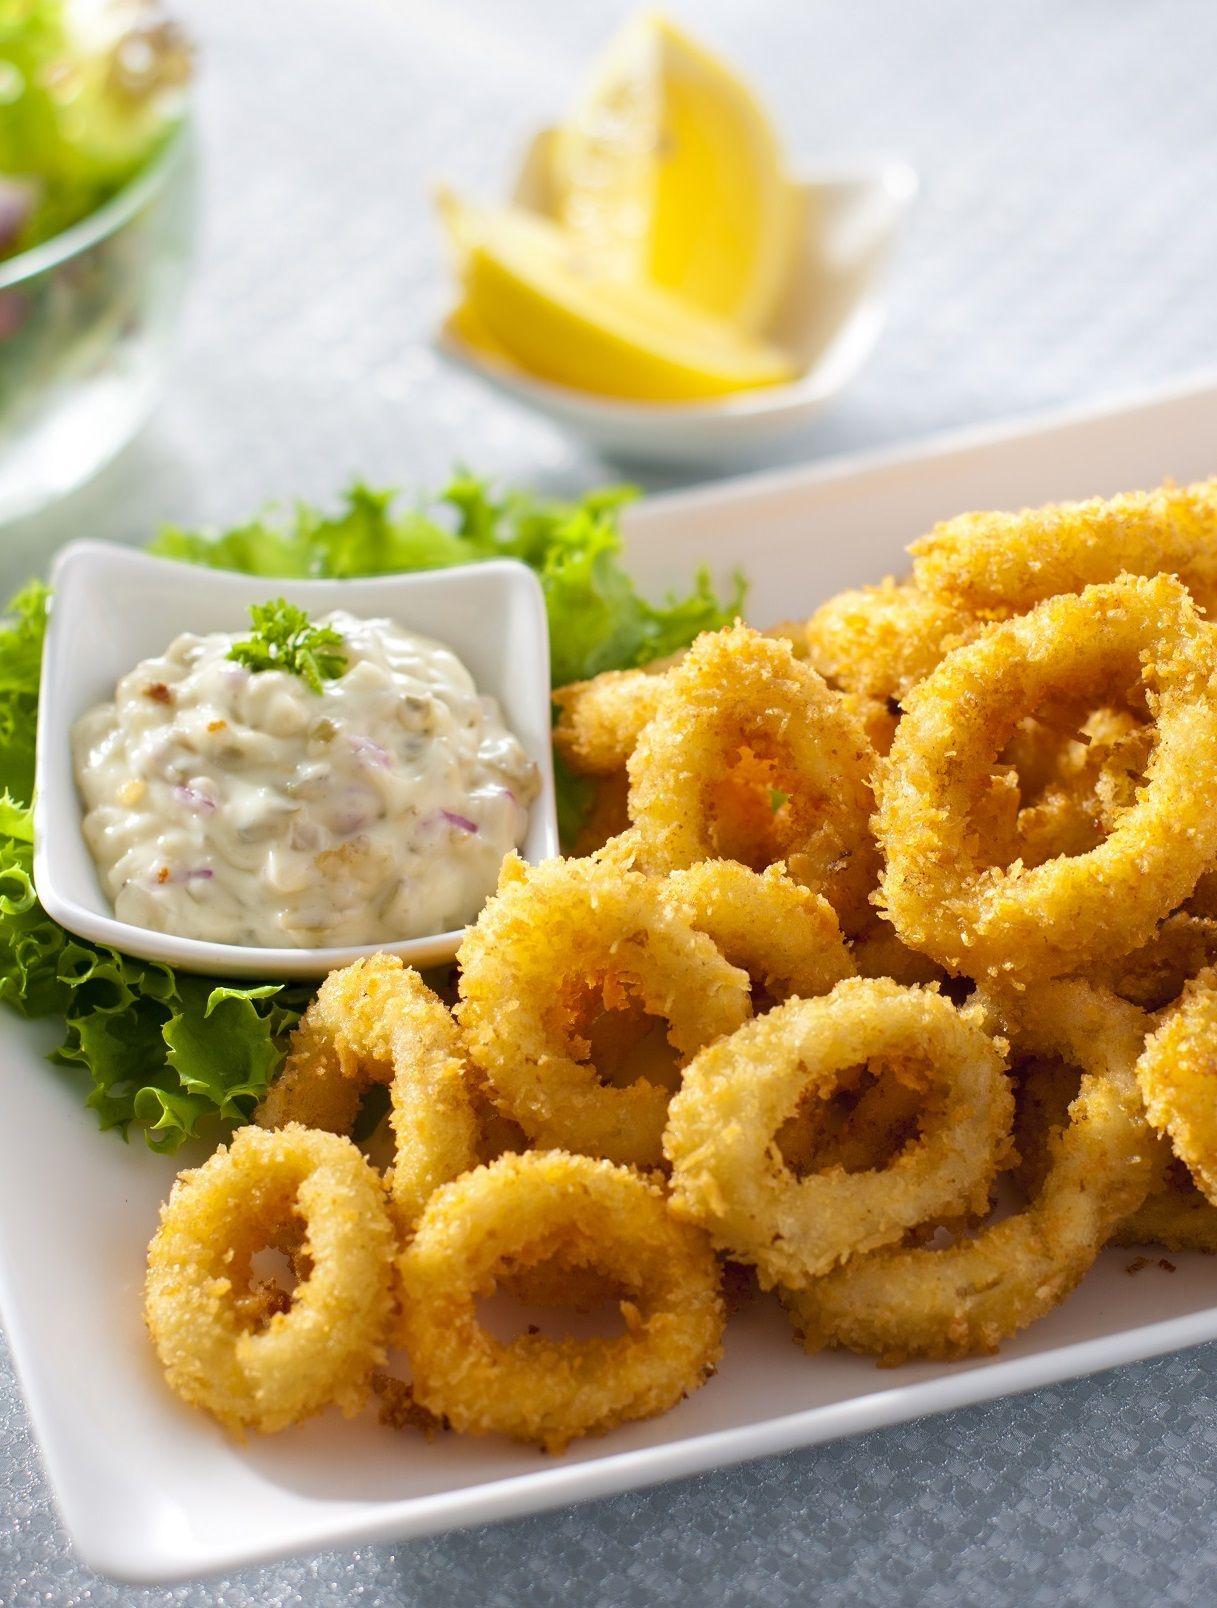 Fried Calamari (With images) Fried calamari, Fries, Food